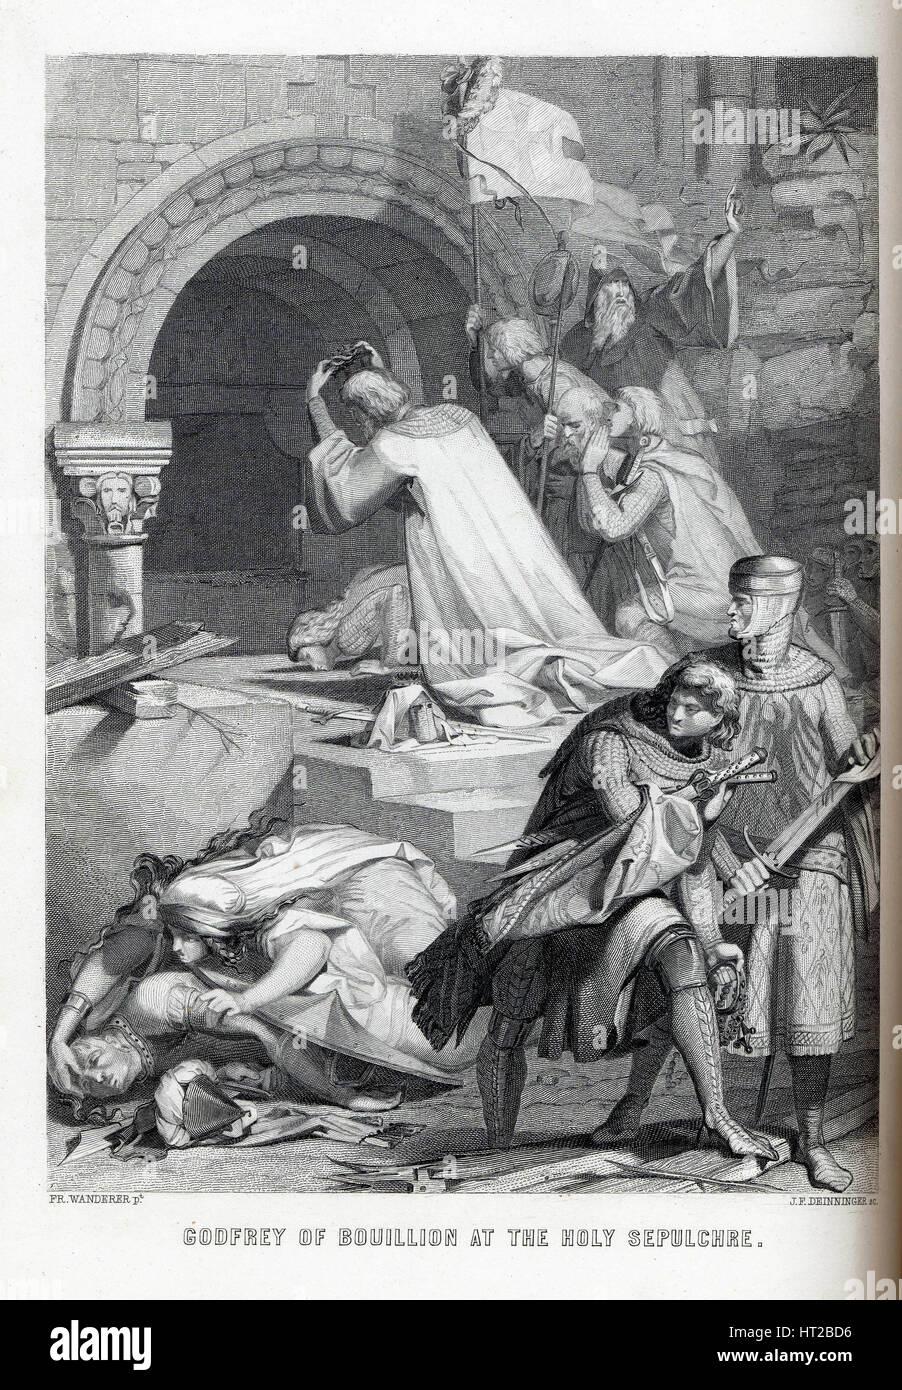 Godfrey of Bouillon at the Holy Sepulchre, 1882. Artist: Deininger, Jacob Friedrich (1836-1880s) - Stock Image